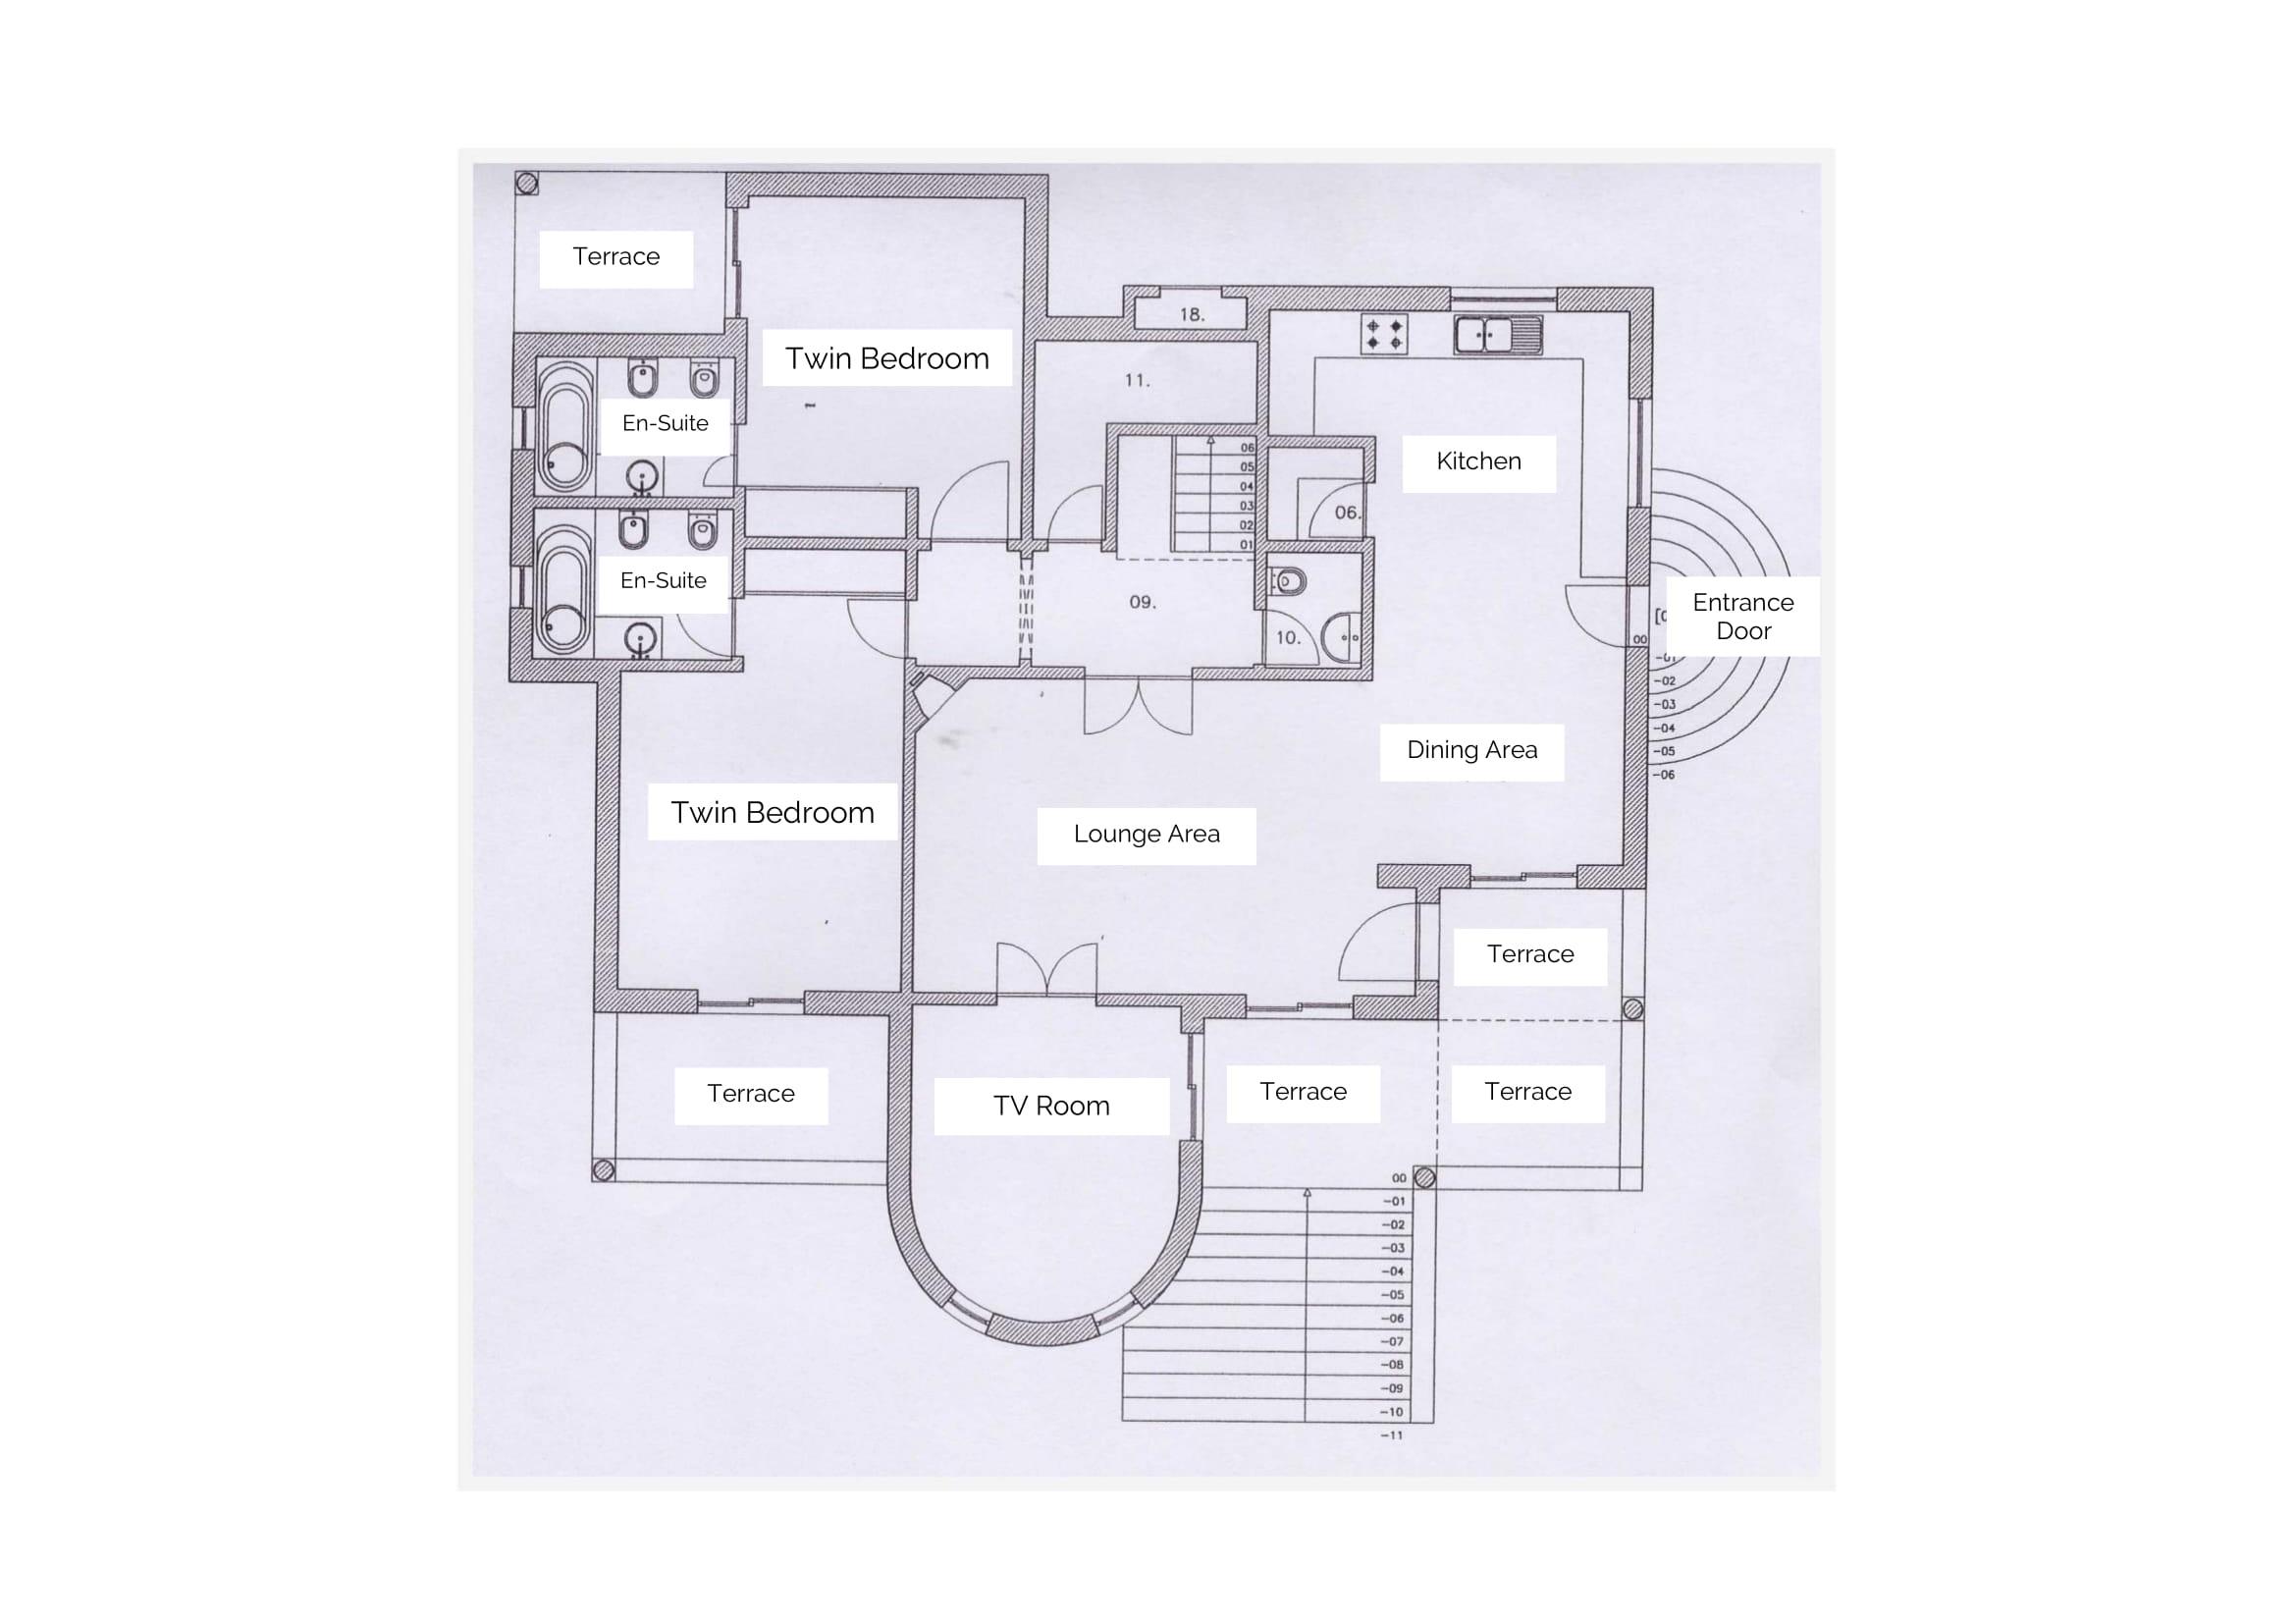 Villa Quina Ground Floor Layout